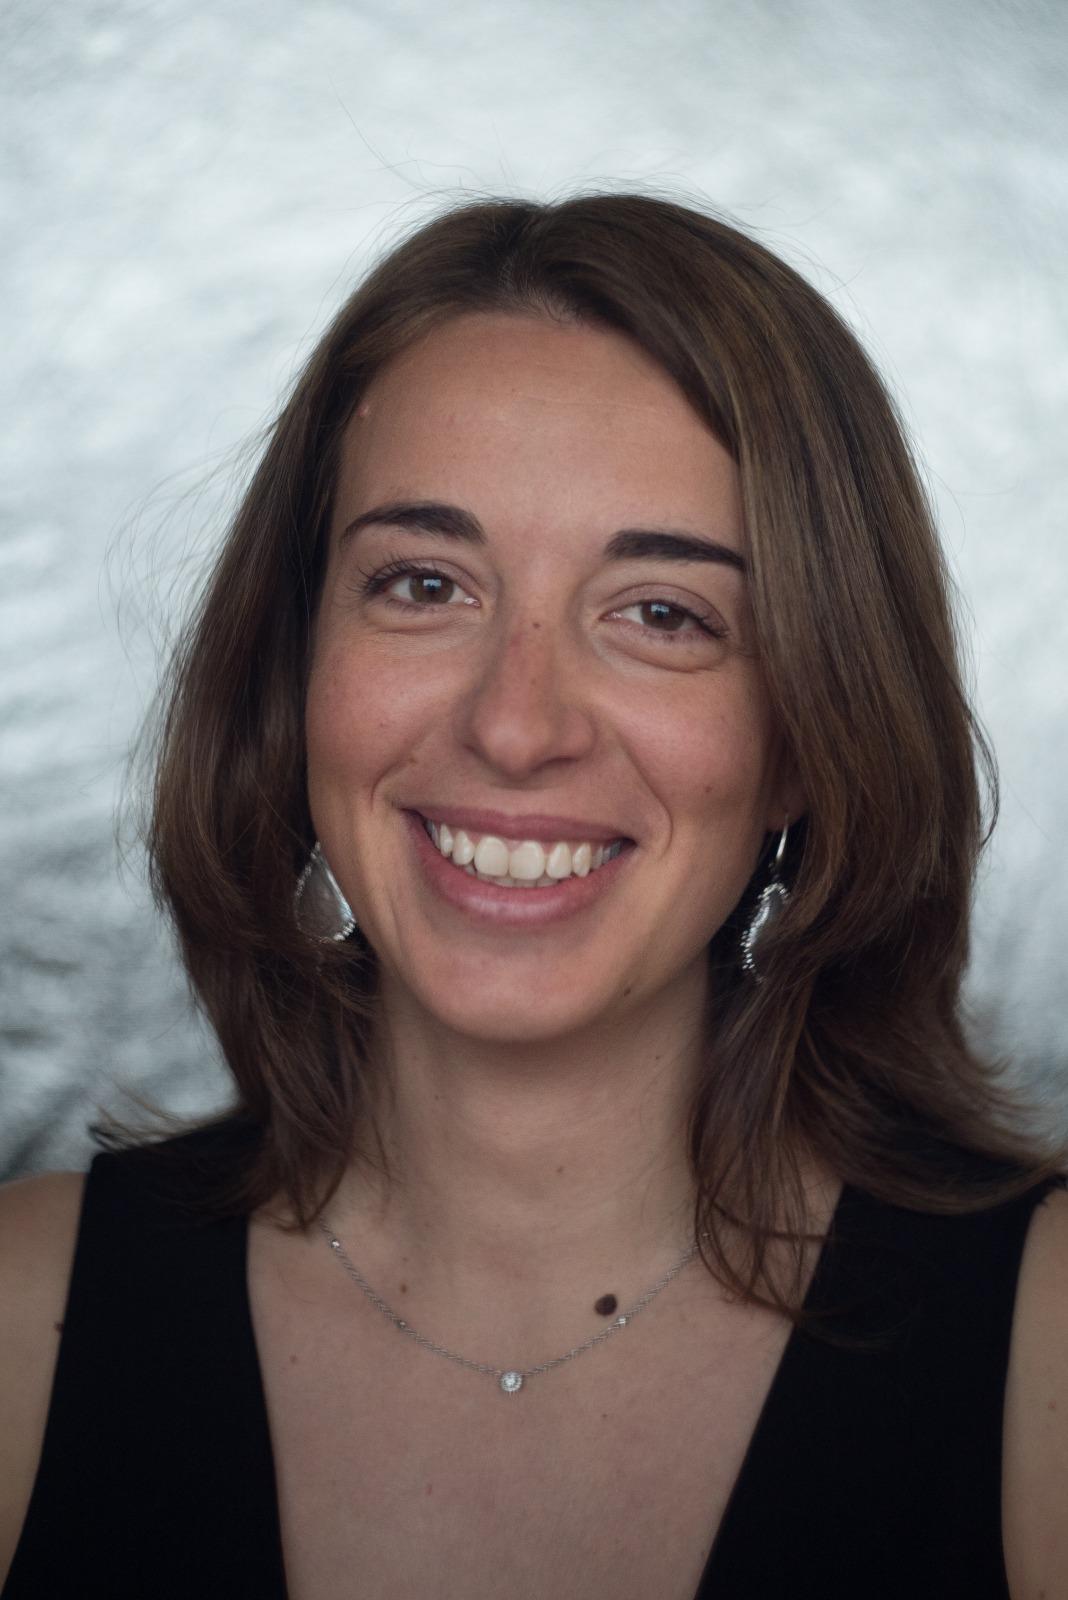 Giulia Pinna